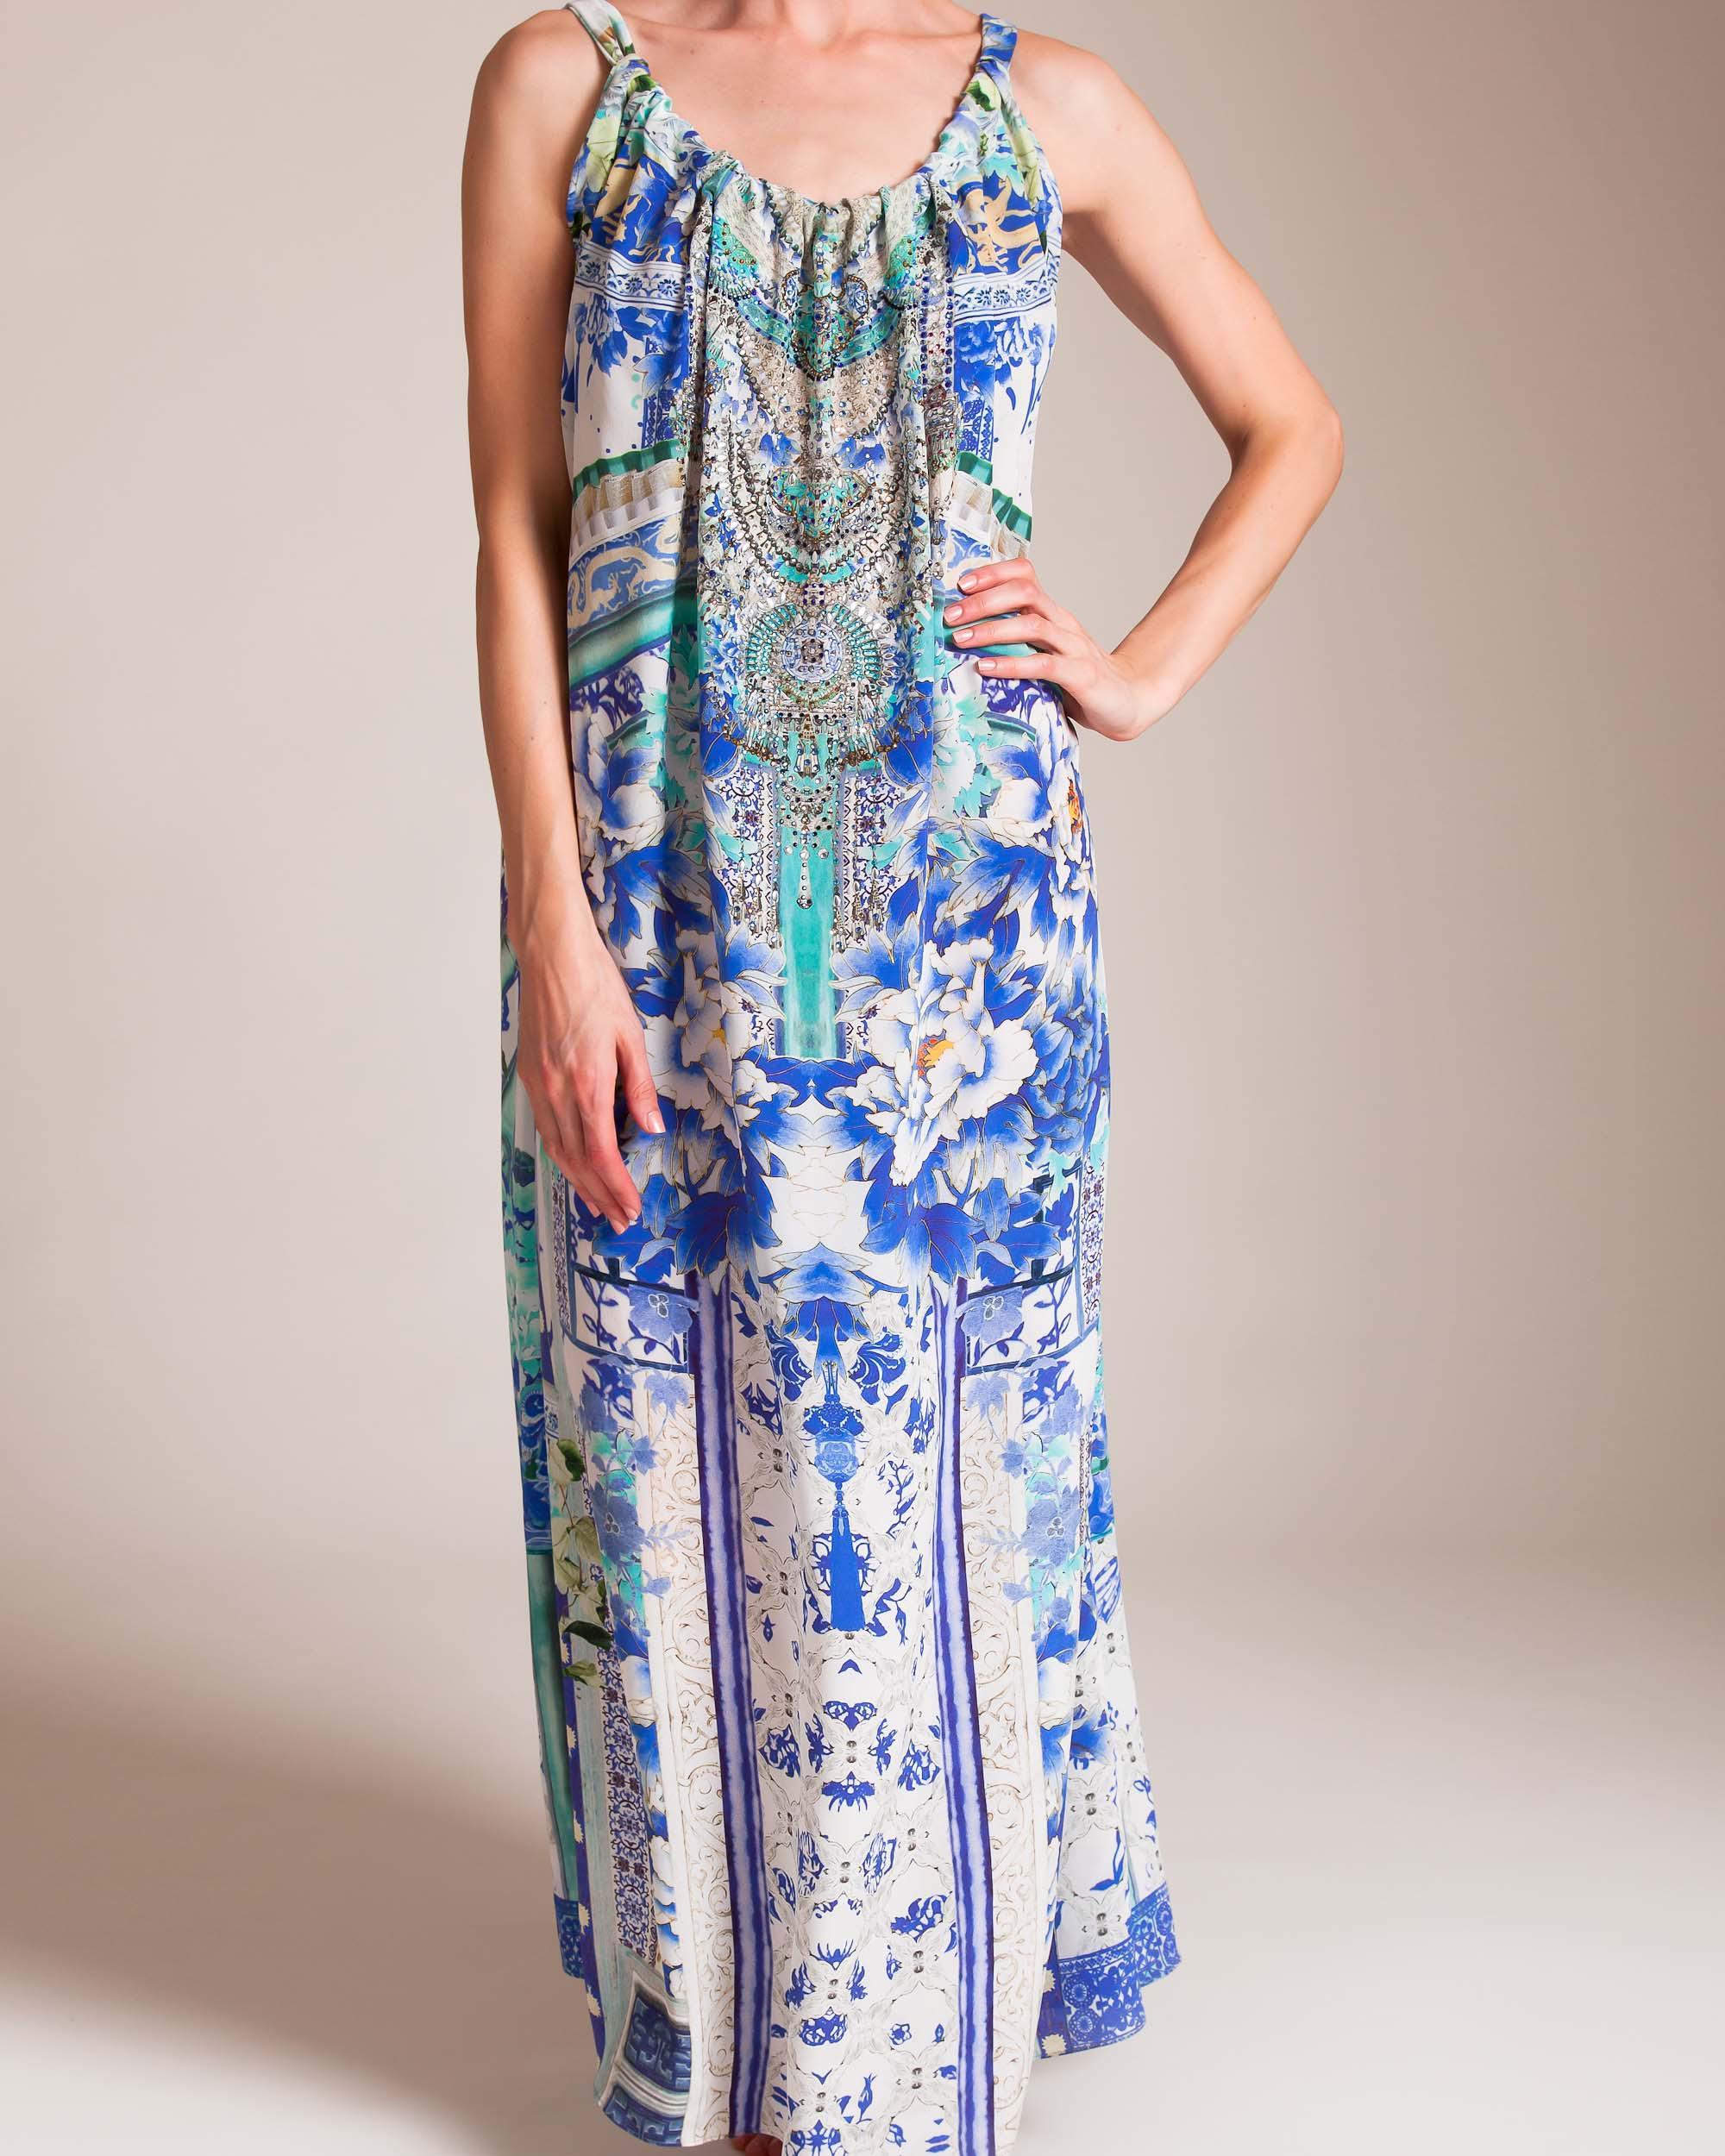 Lyst - Camilla Porcelain Paradise Drawstring Dress in Blue 44d7b71df40